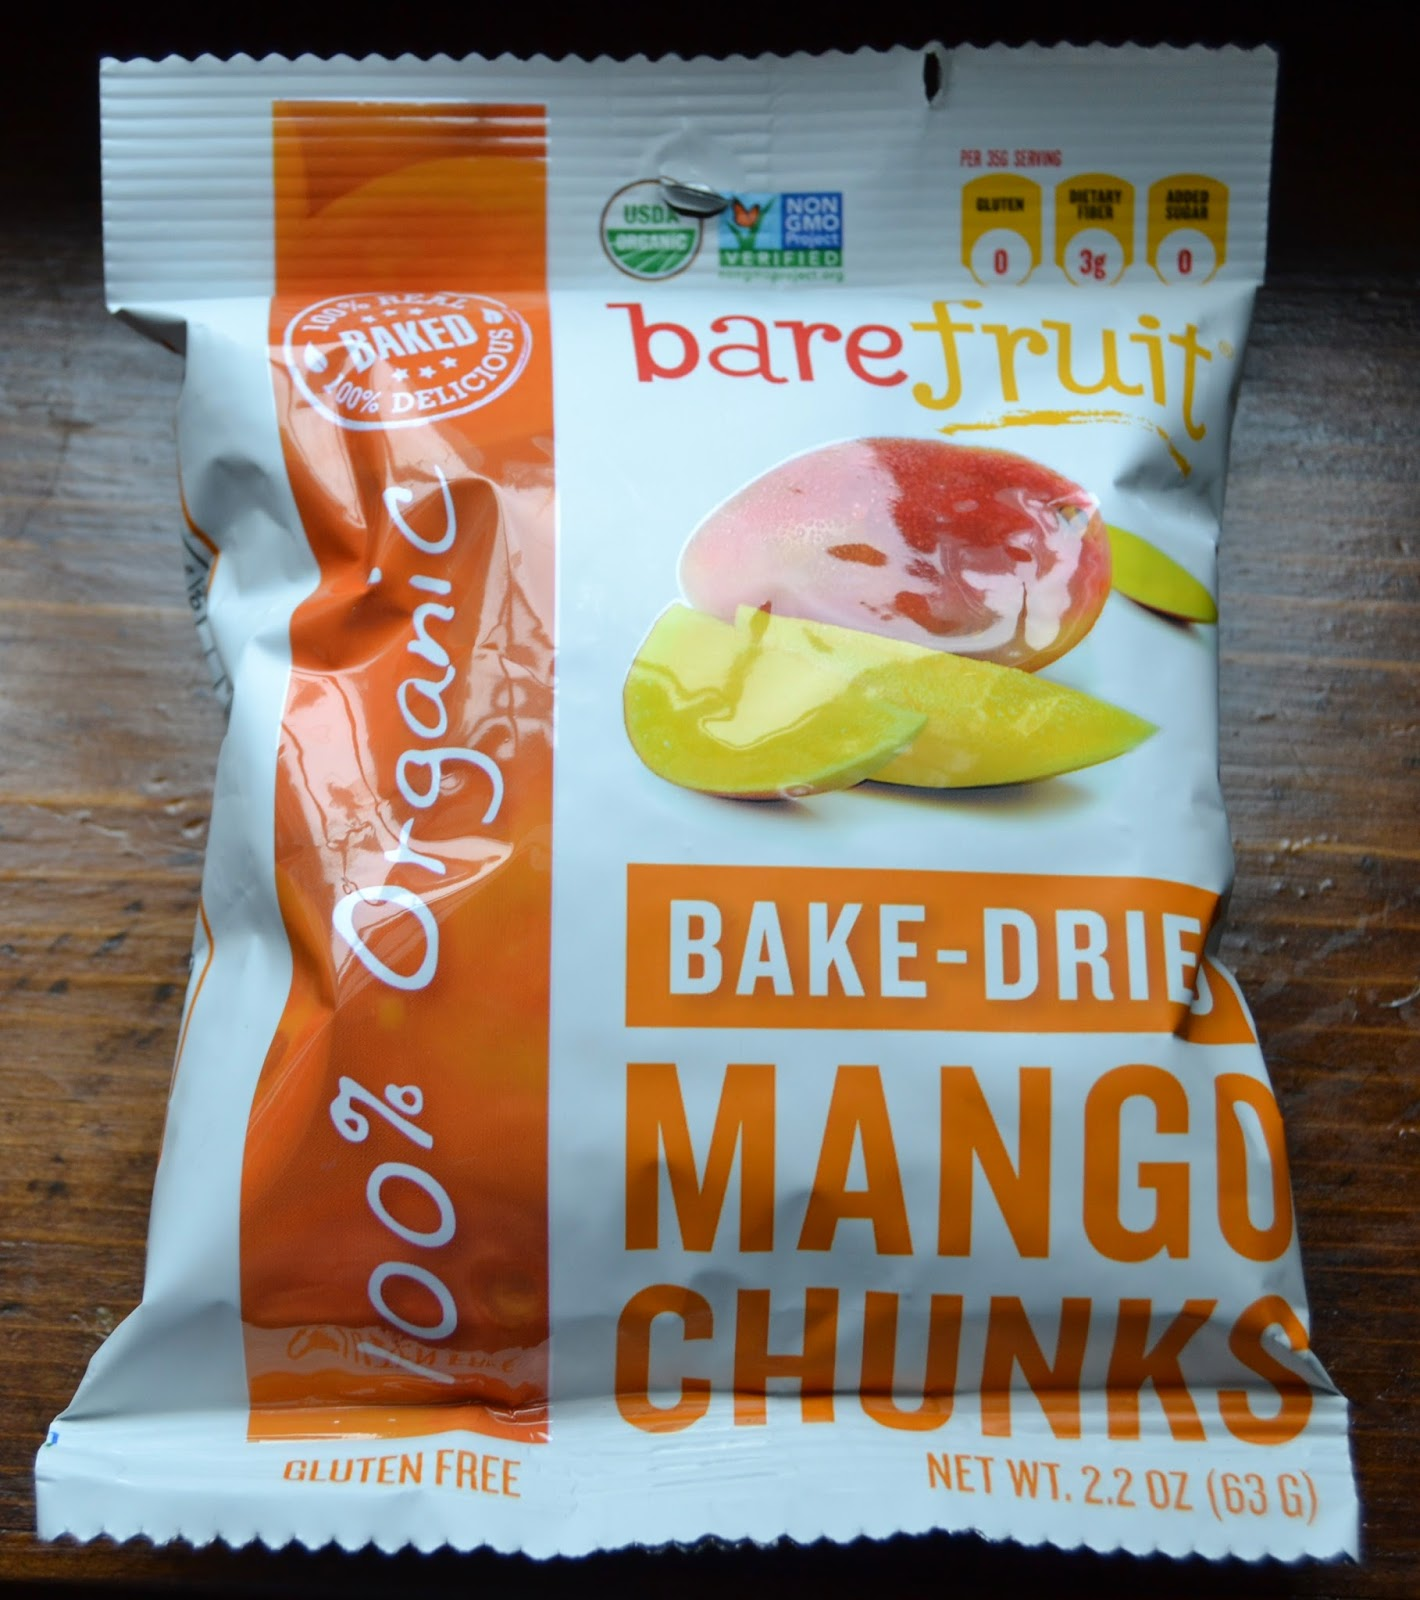 Bare Fruit Bake-Dried Mango Chunks